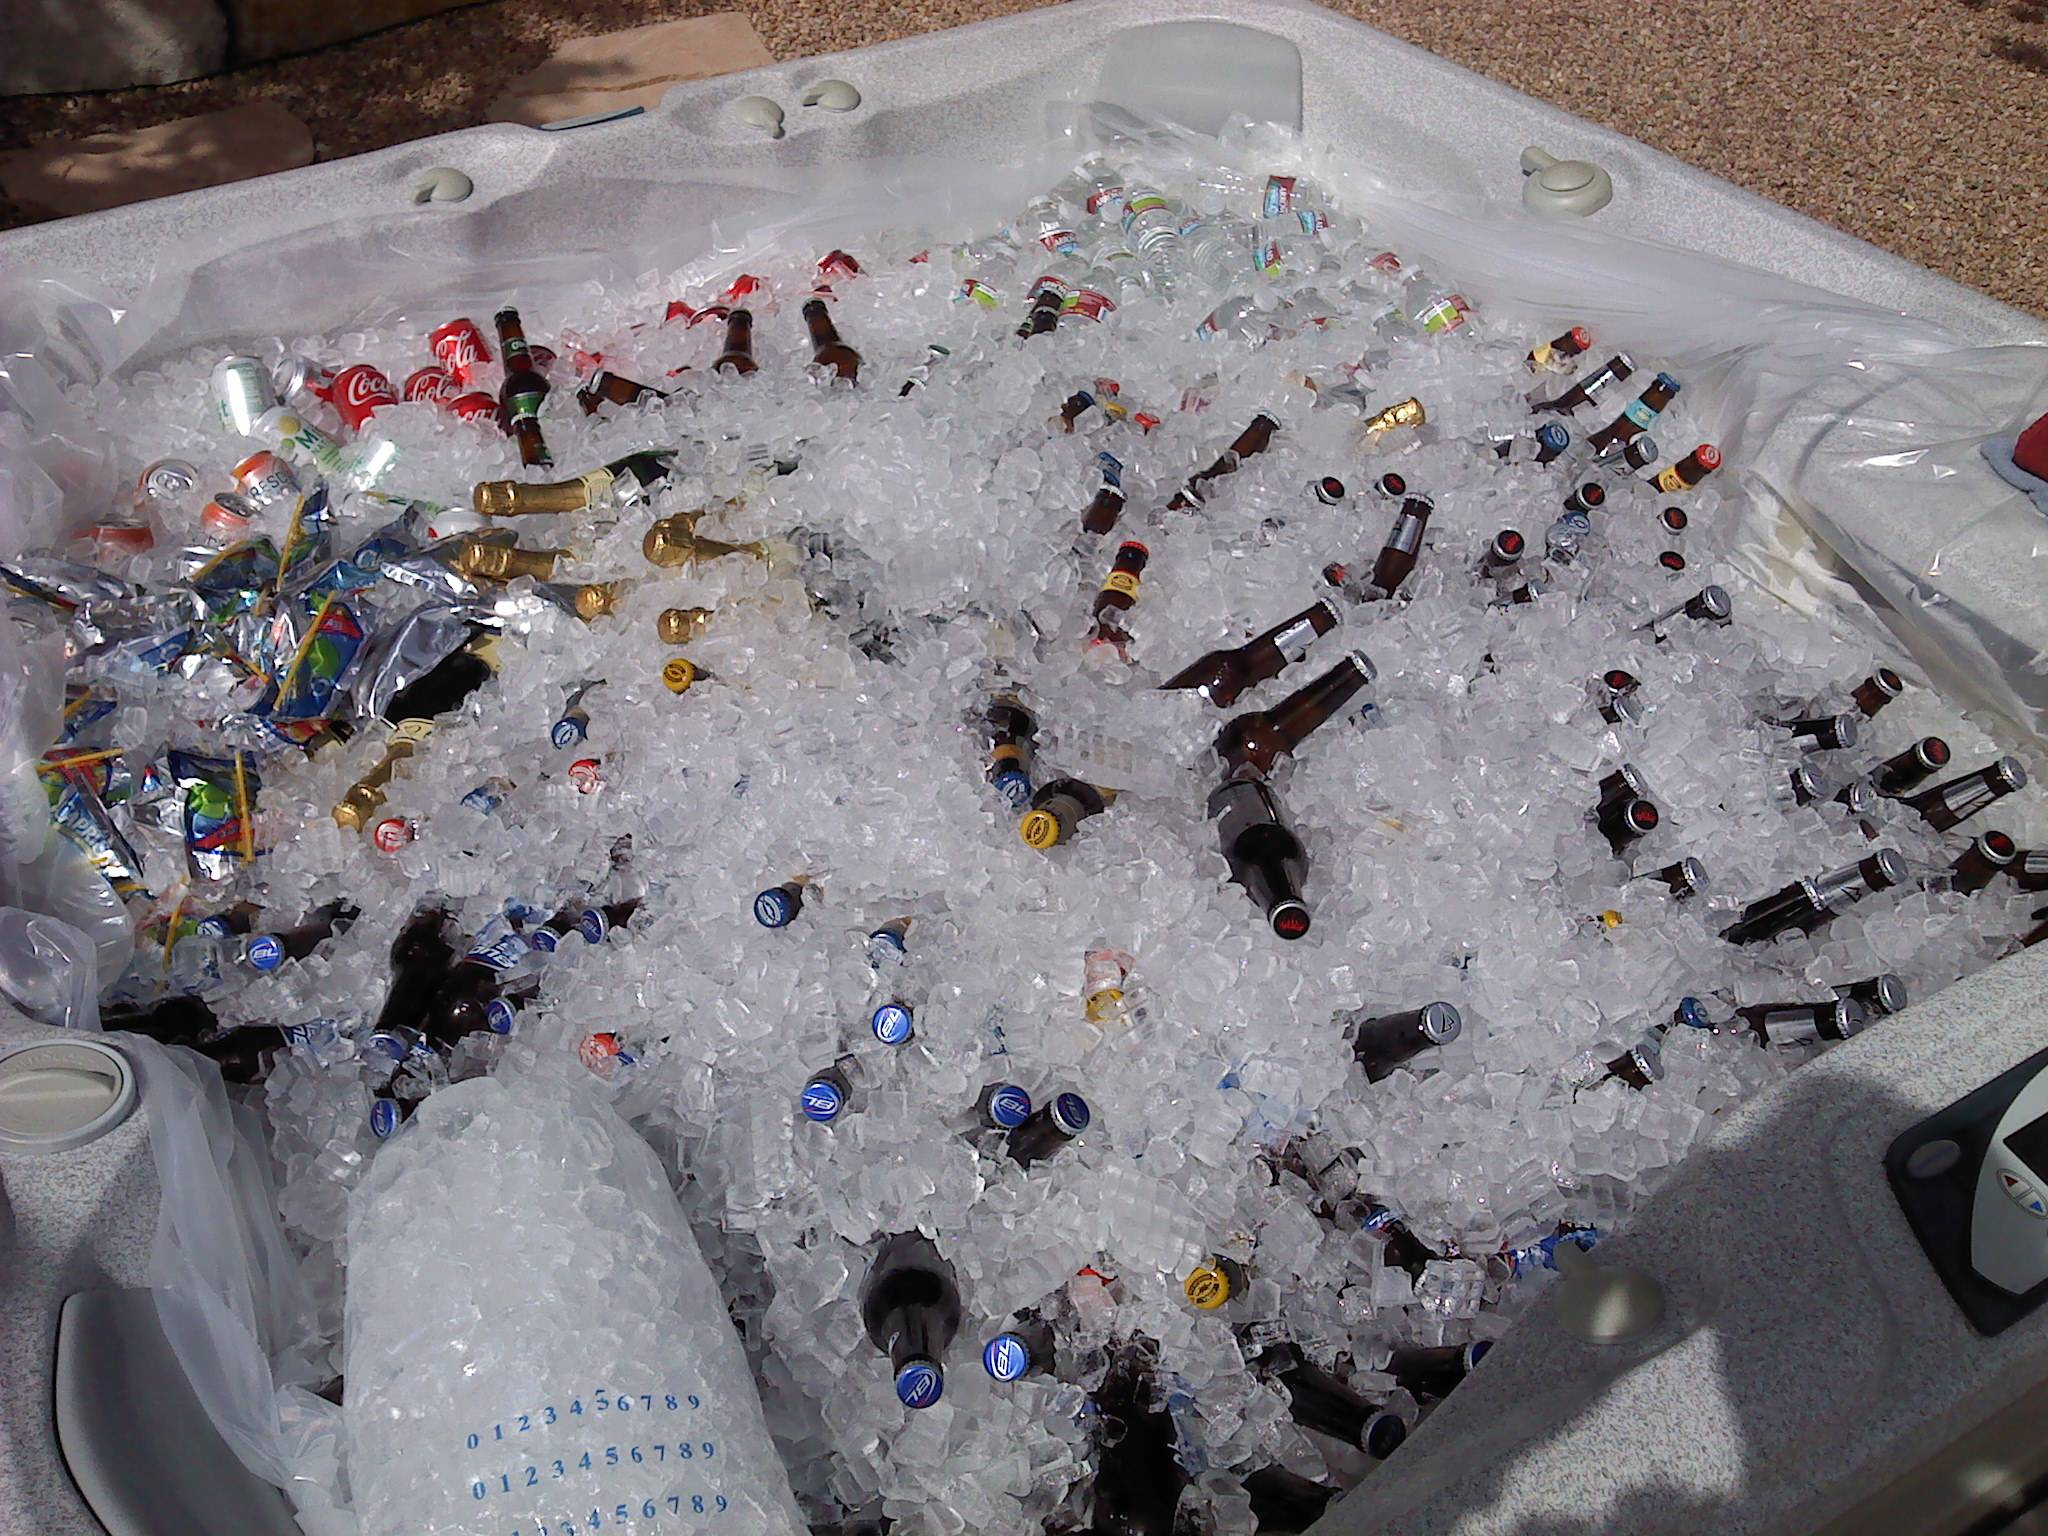 hot tub cooler.jpg